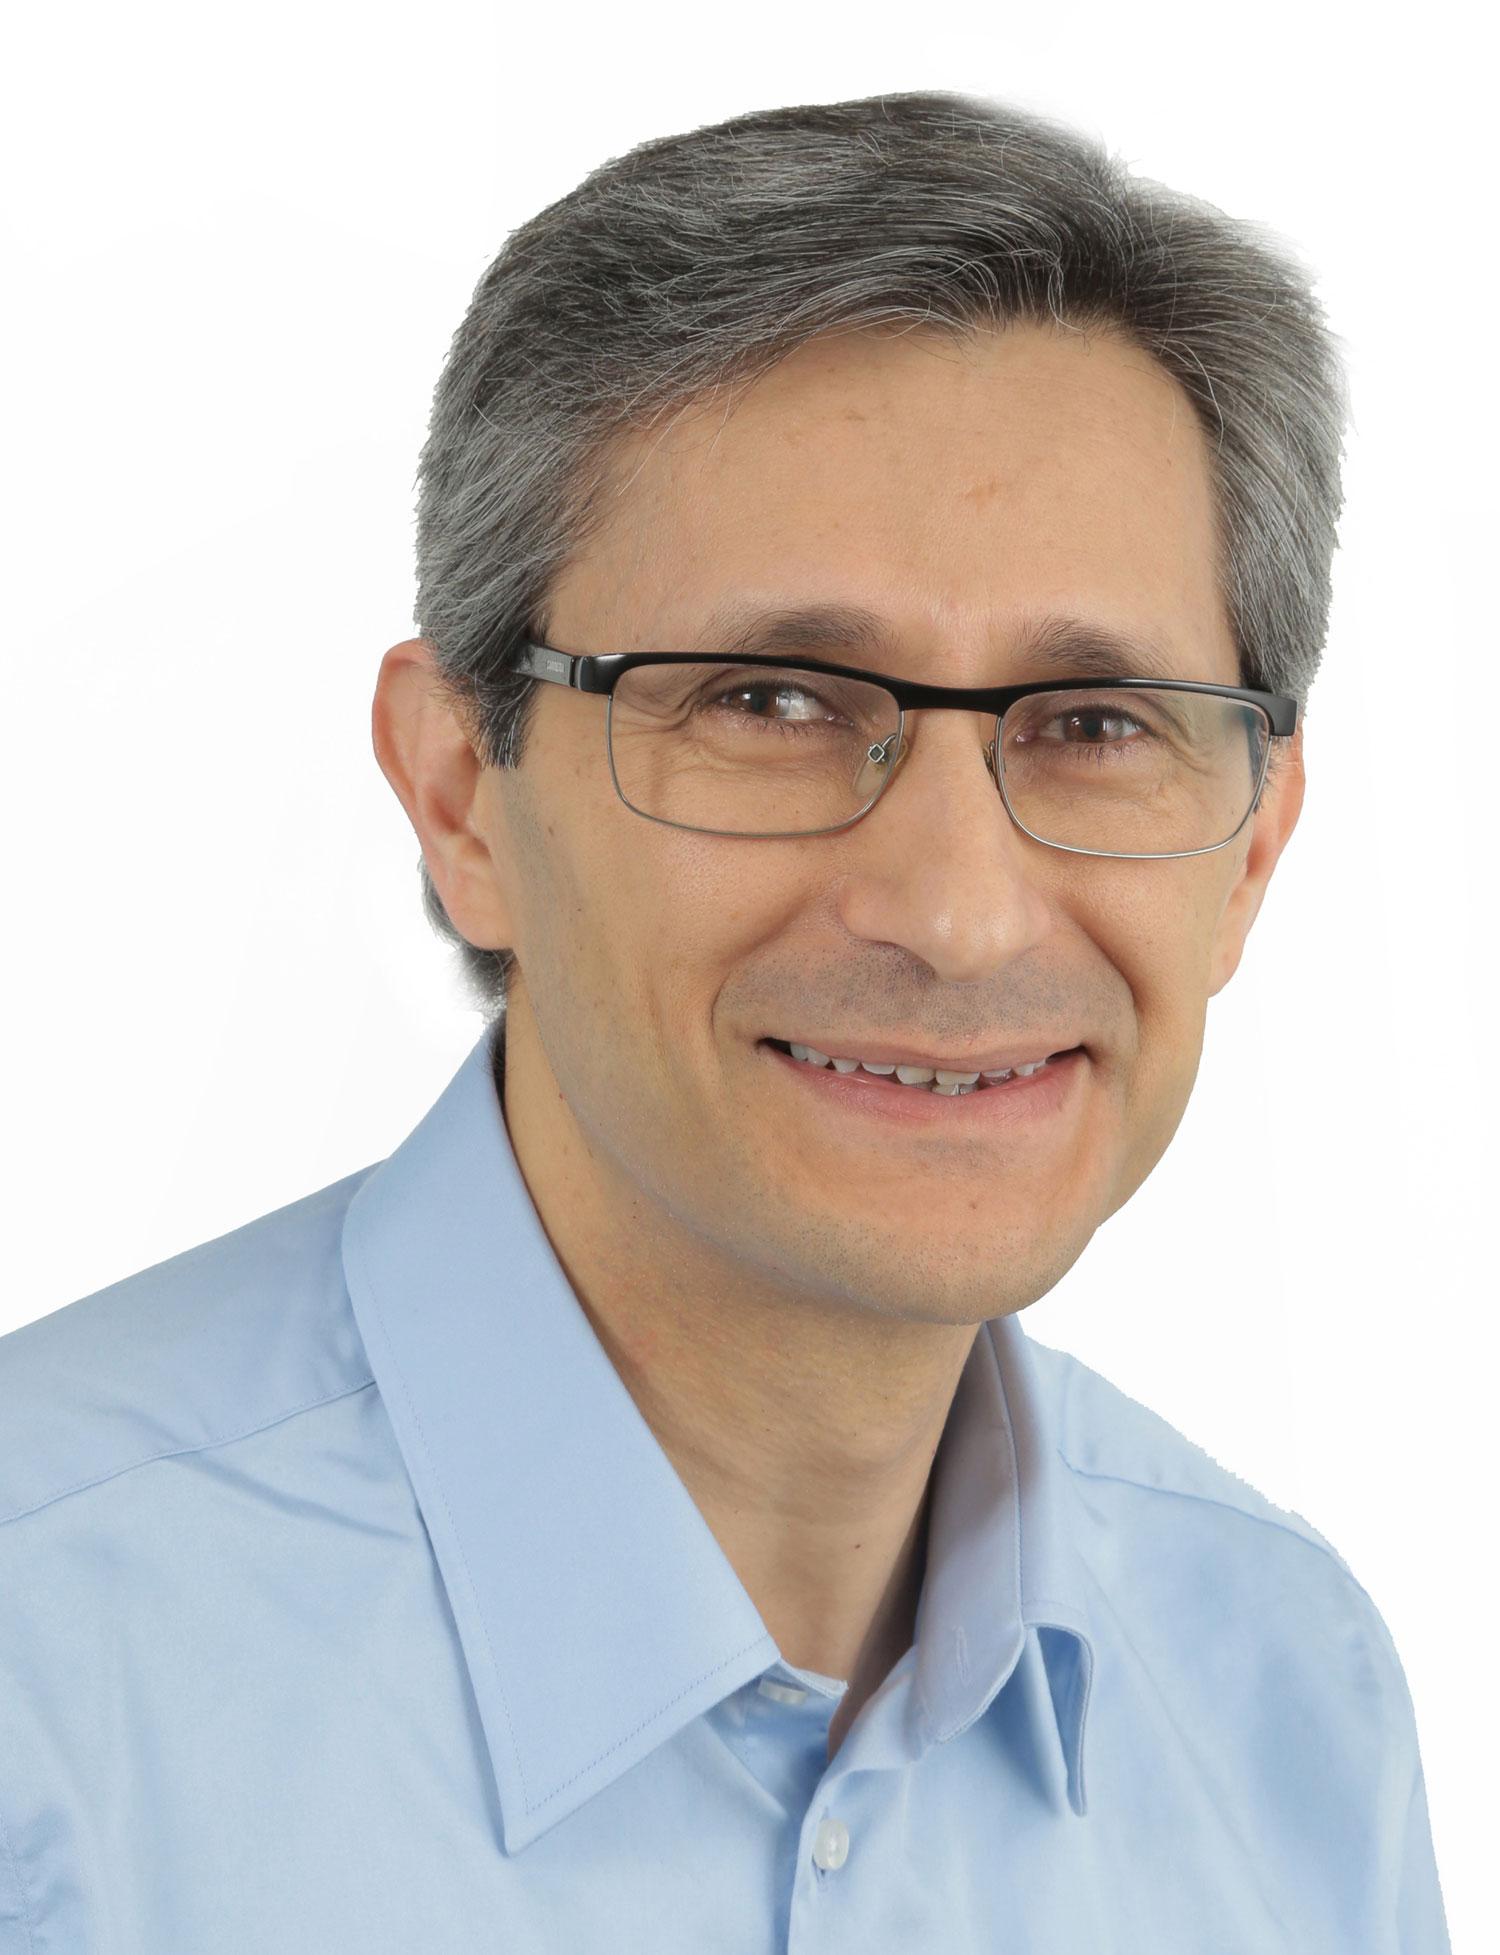 Gianluca Martelliano